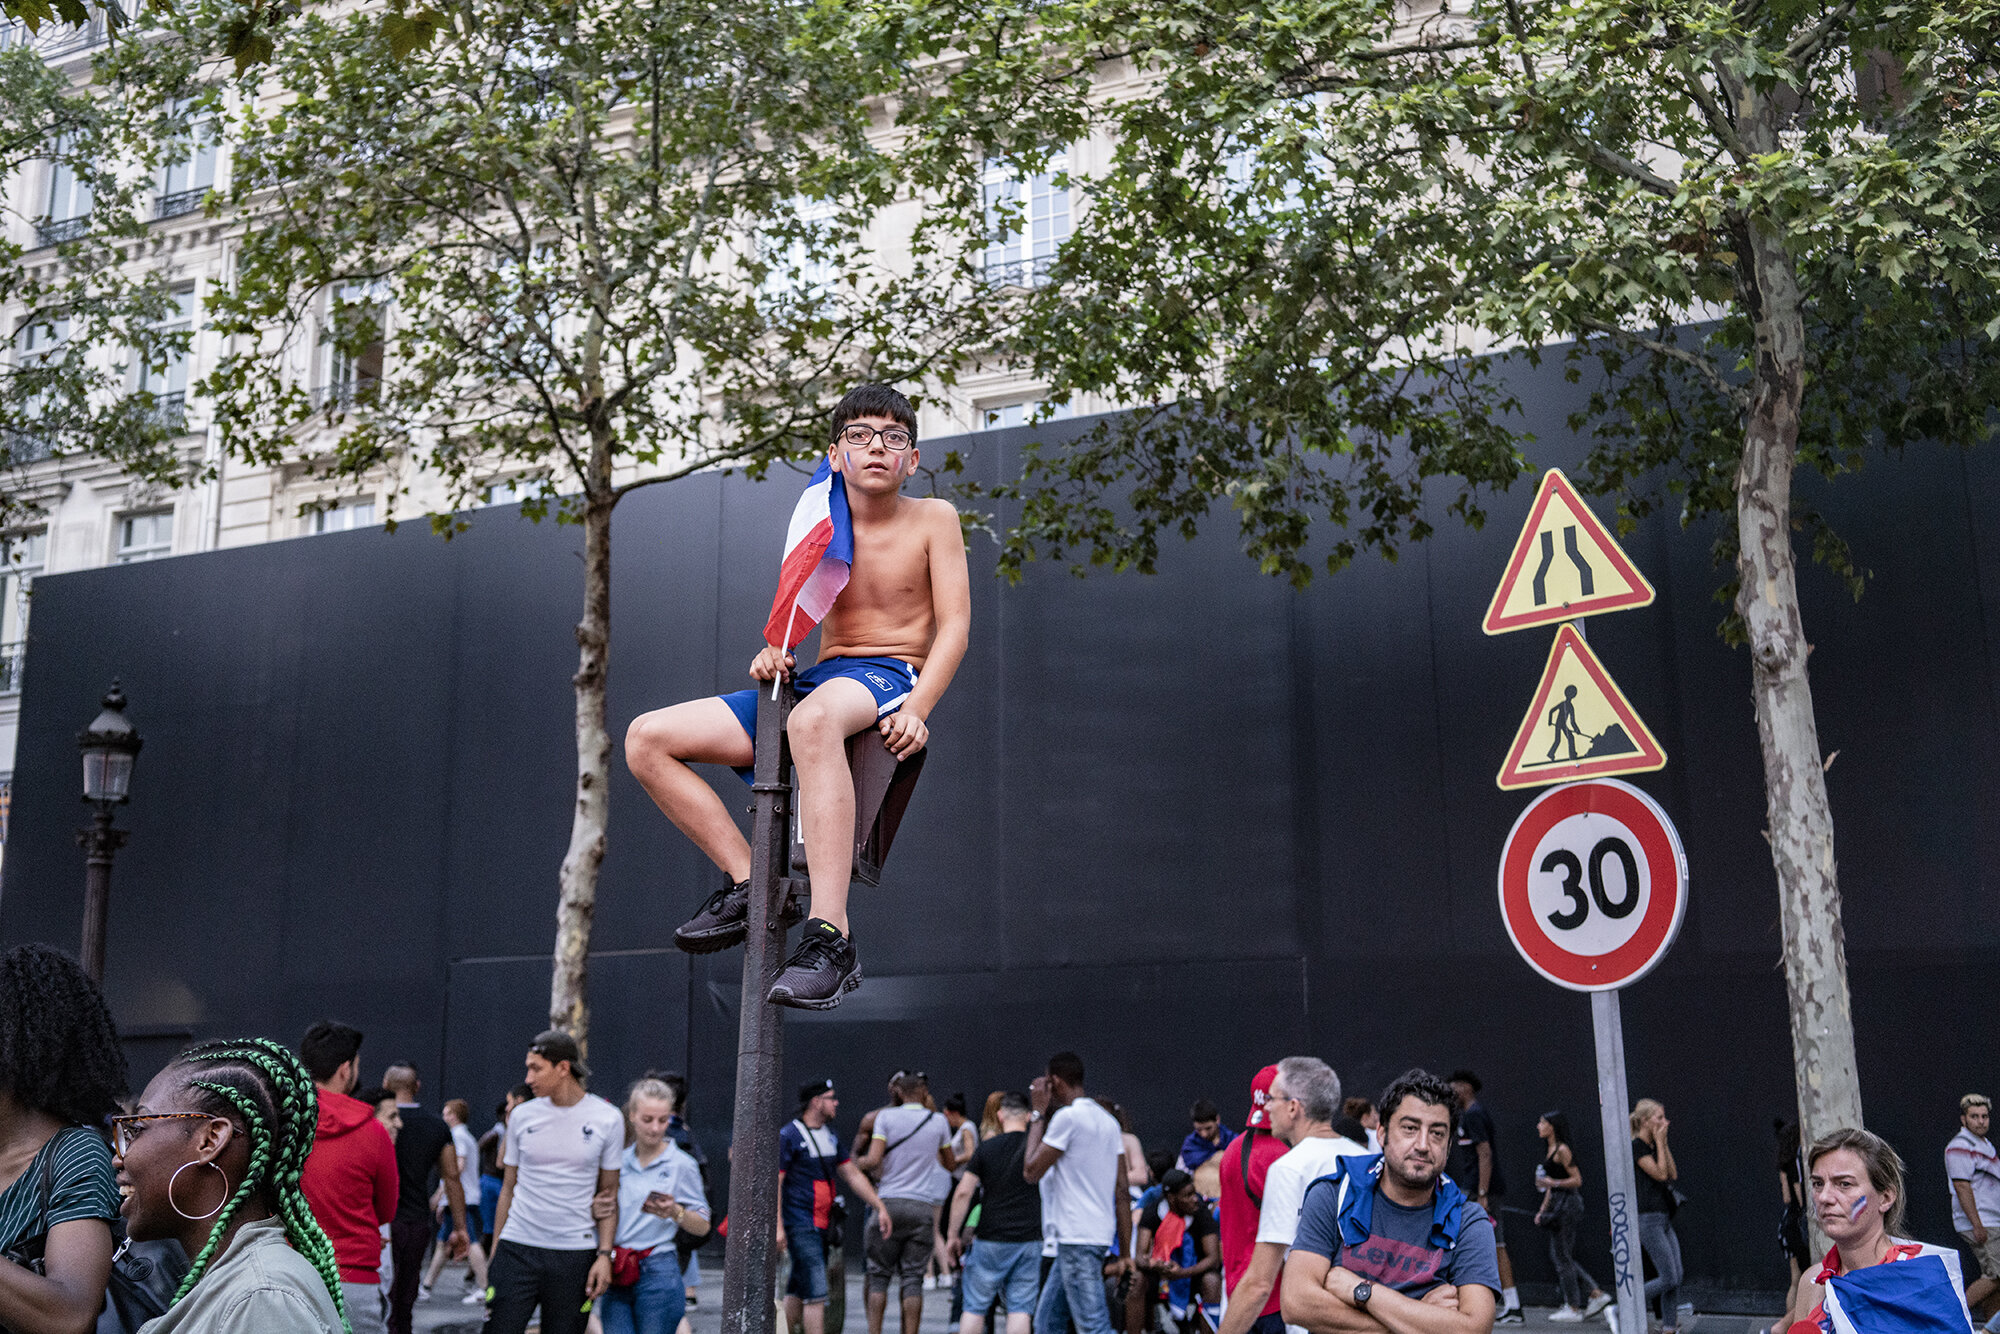 Paris_World_Cup_Celebration_2018-457.jpg